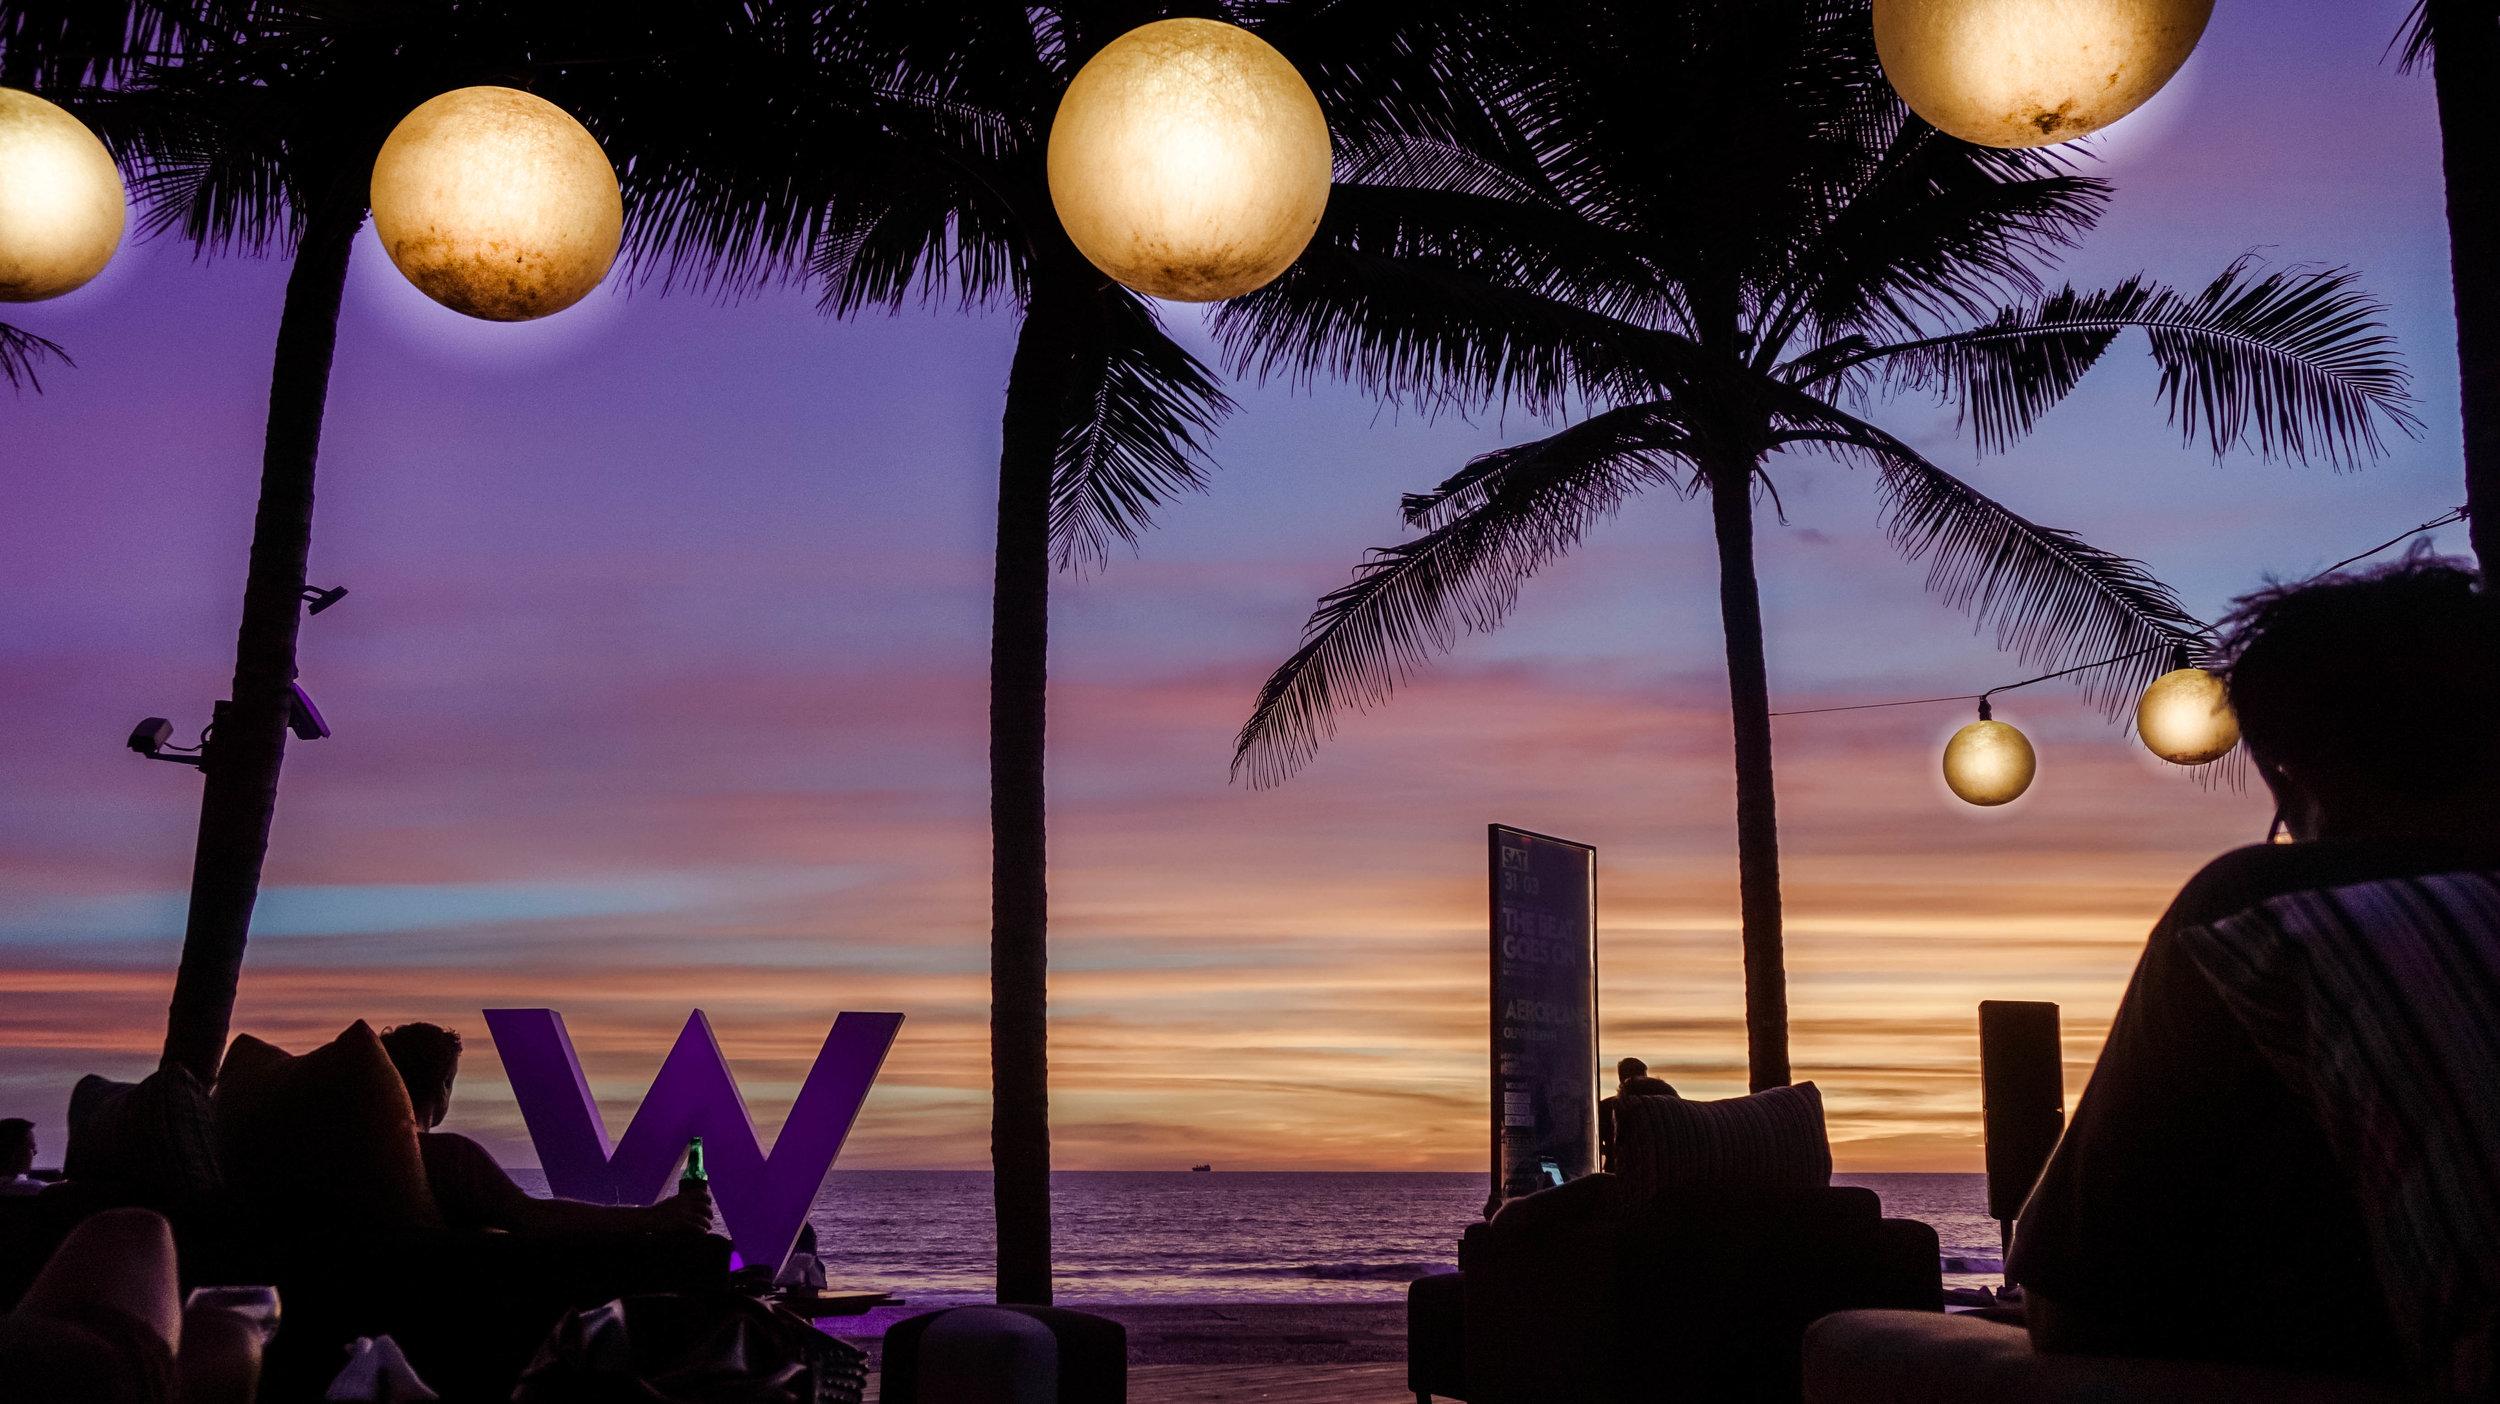 w-bali-seminyak-sunset.jpg